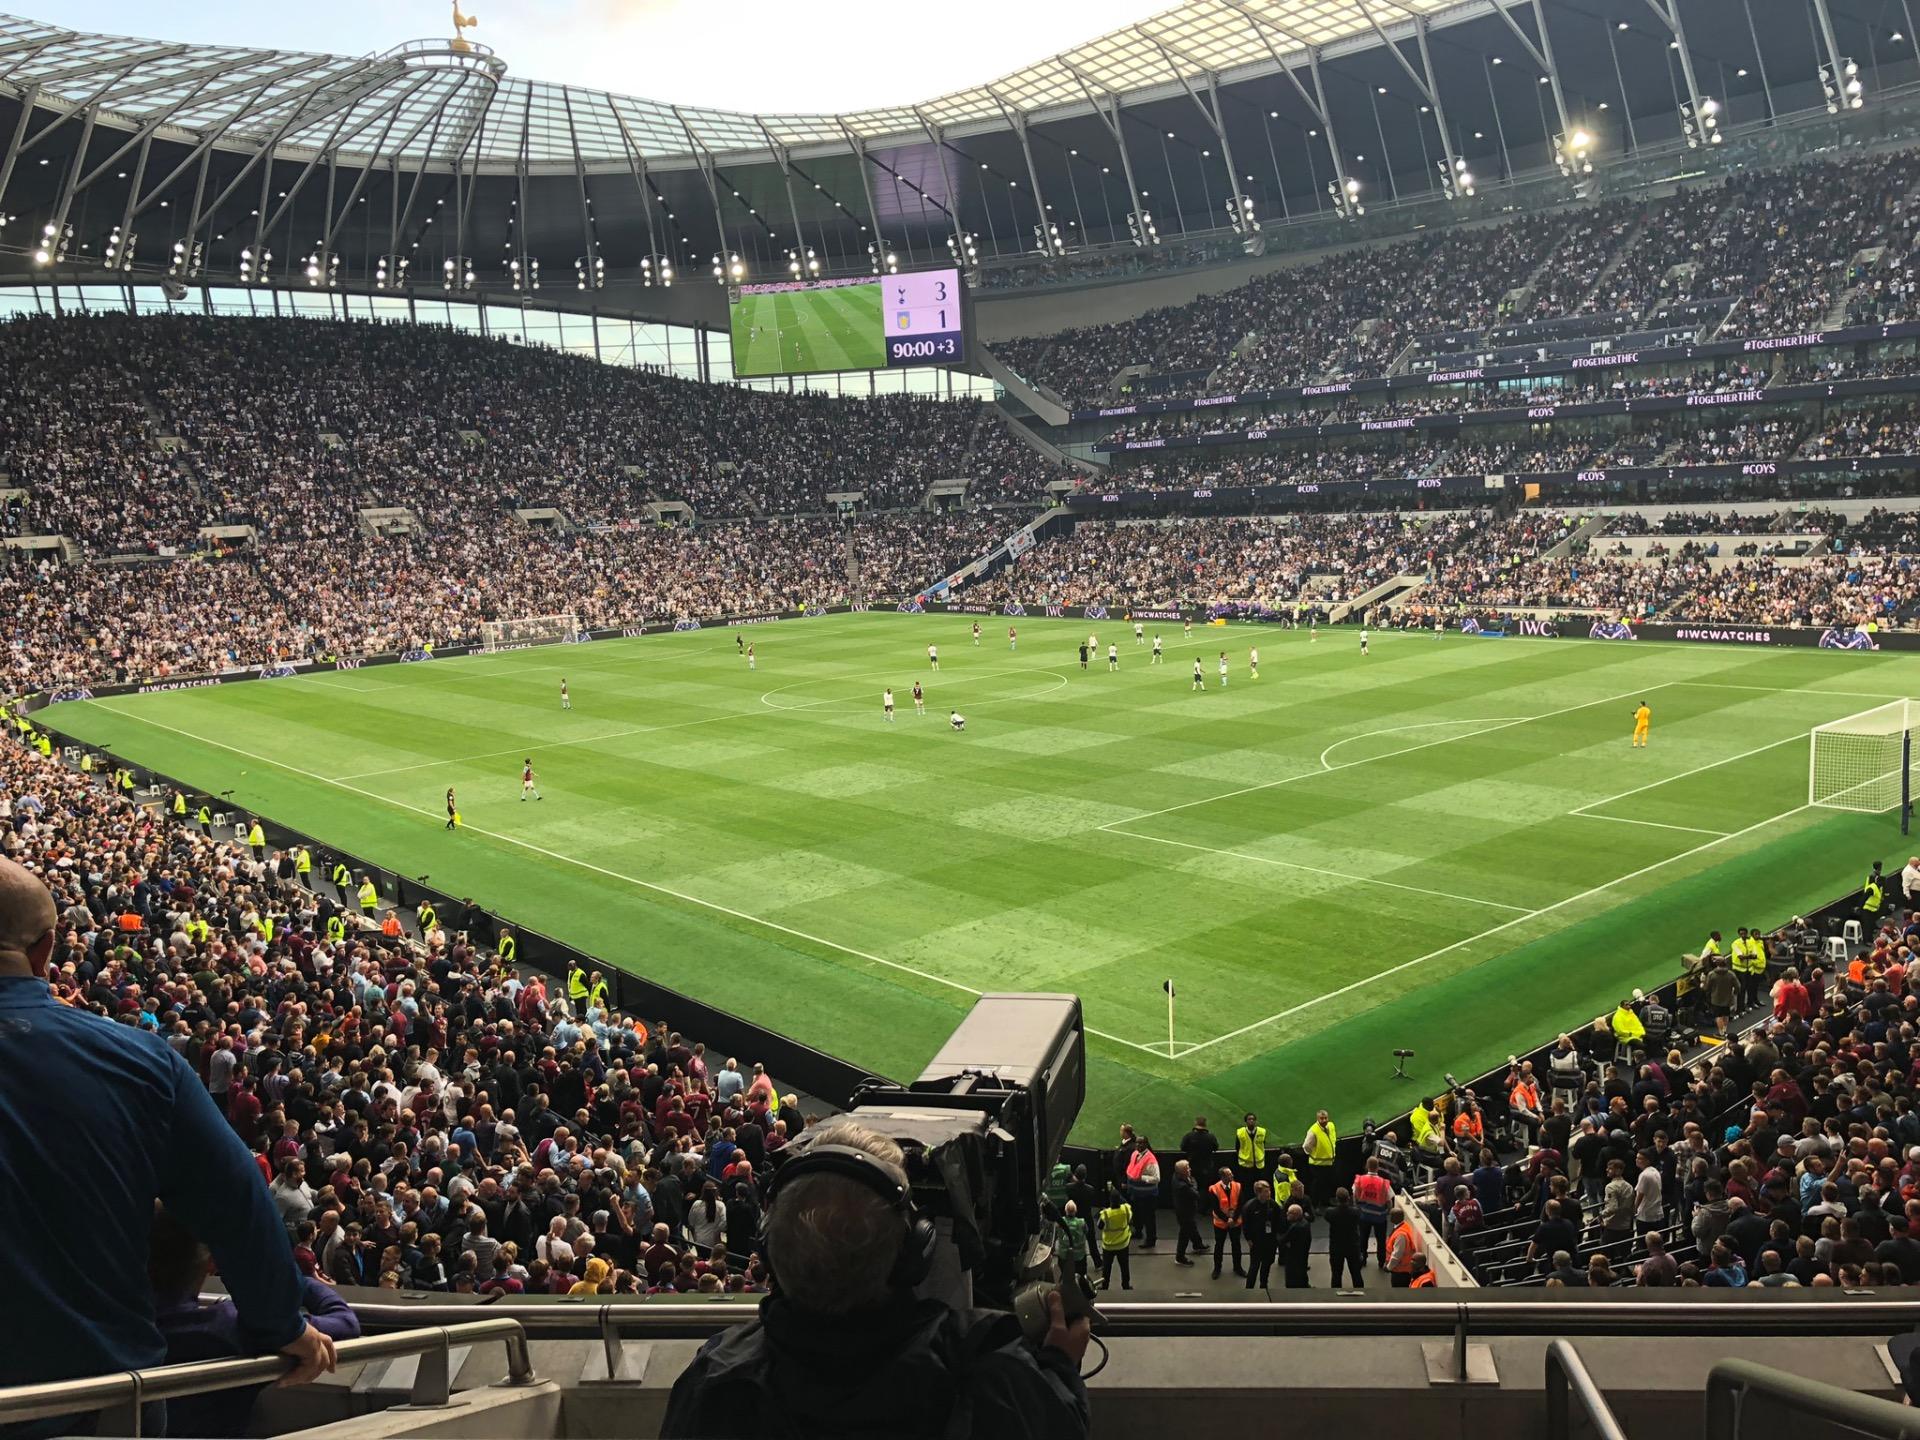 Tottenham Hotspur Stadium Section 424 Row 4 Seat 500